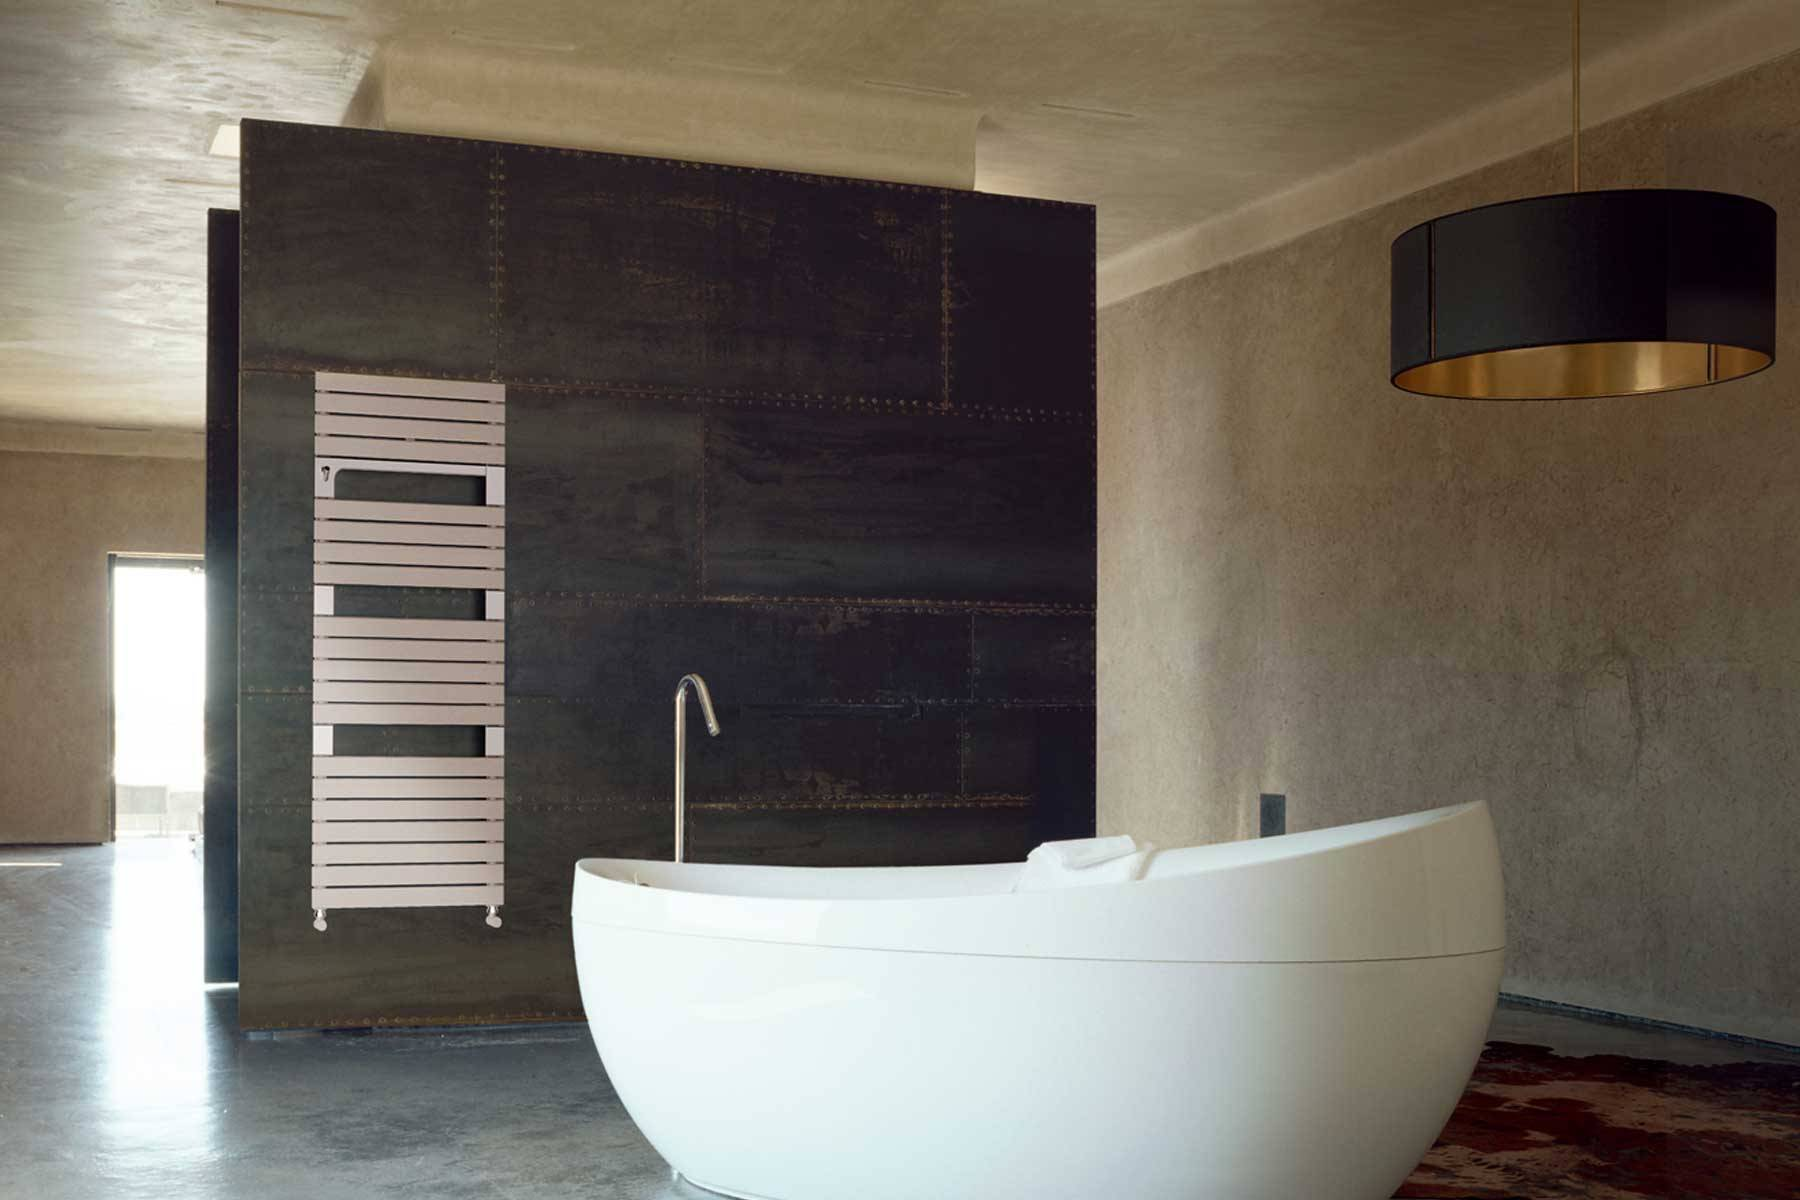 sèche-serviettes Torino-quartz-ambiance-salle de bain